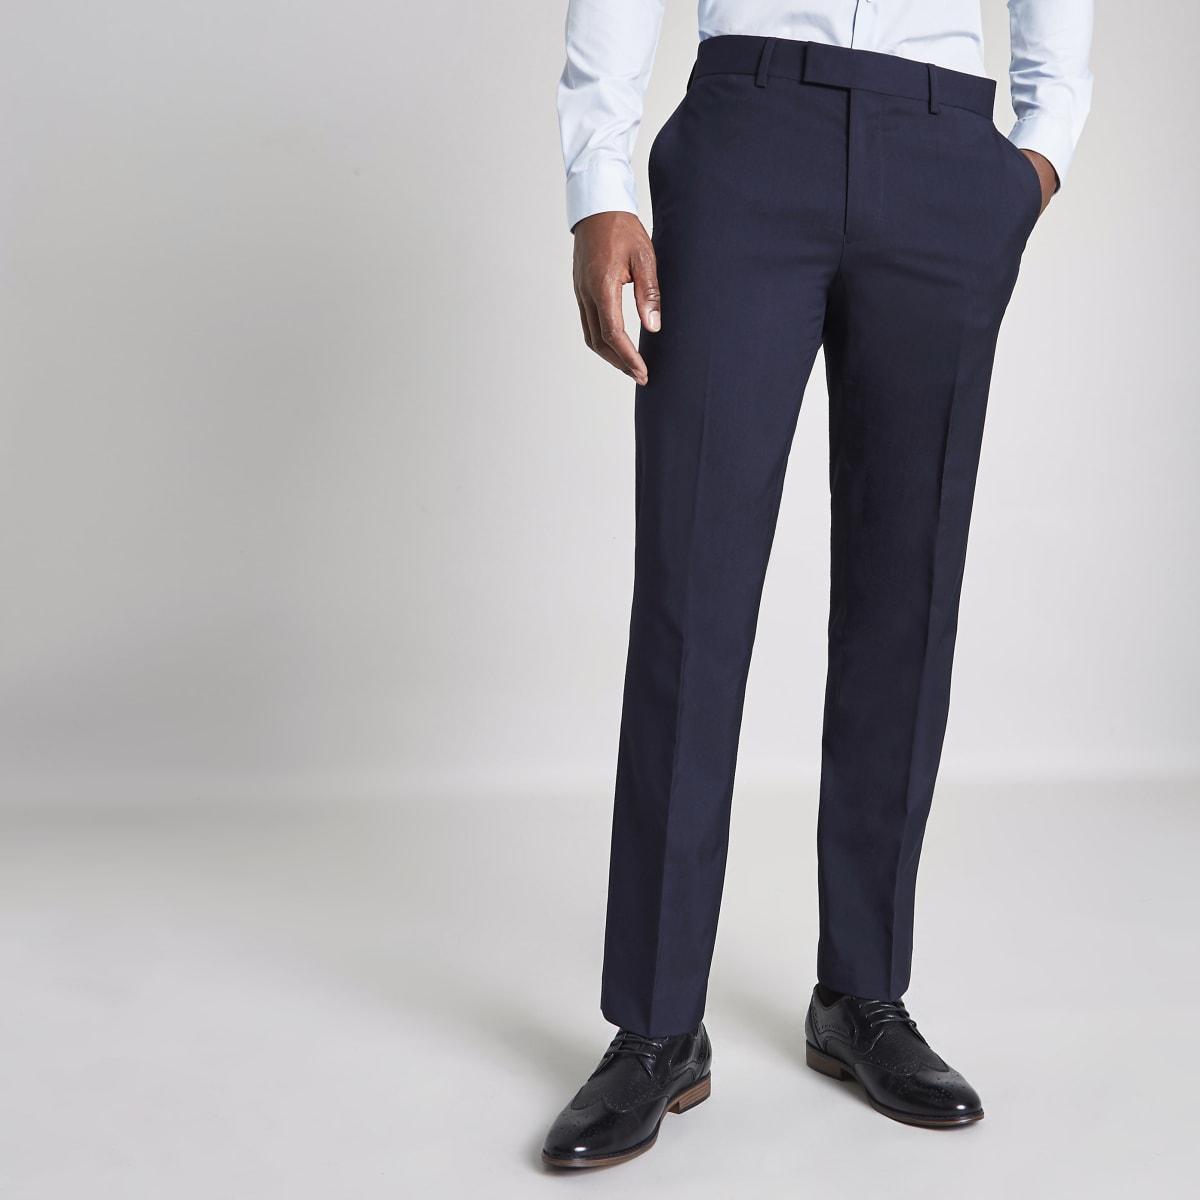 Marineblauwe tailored skinny-fit pantalon